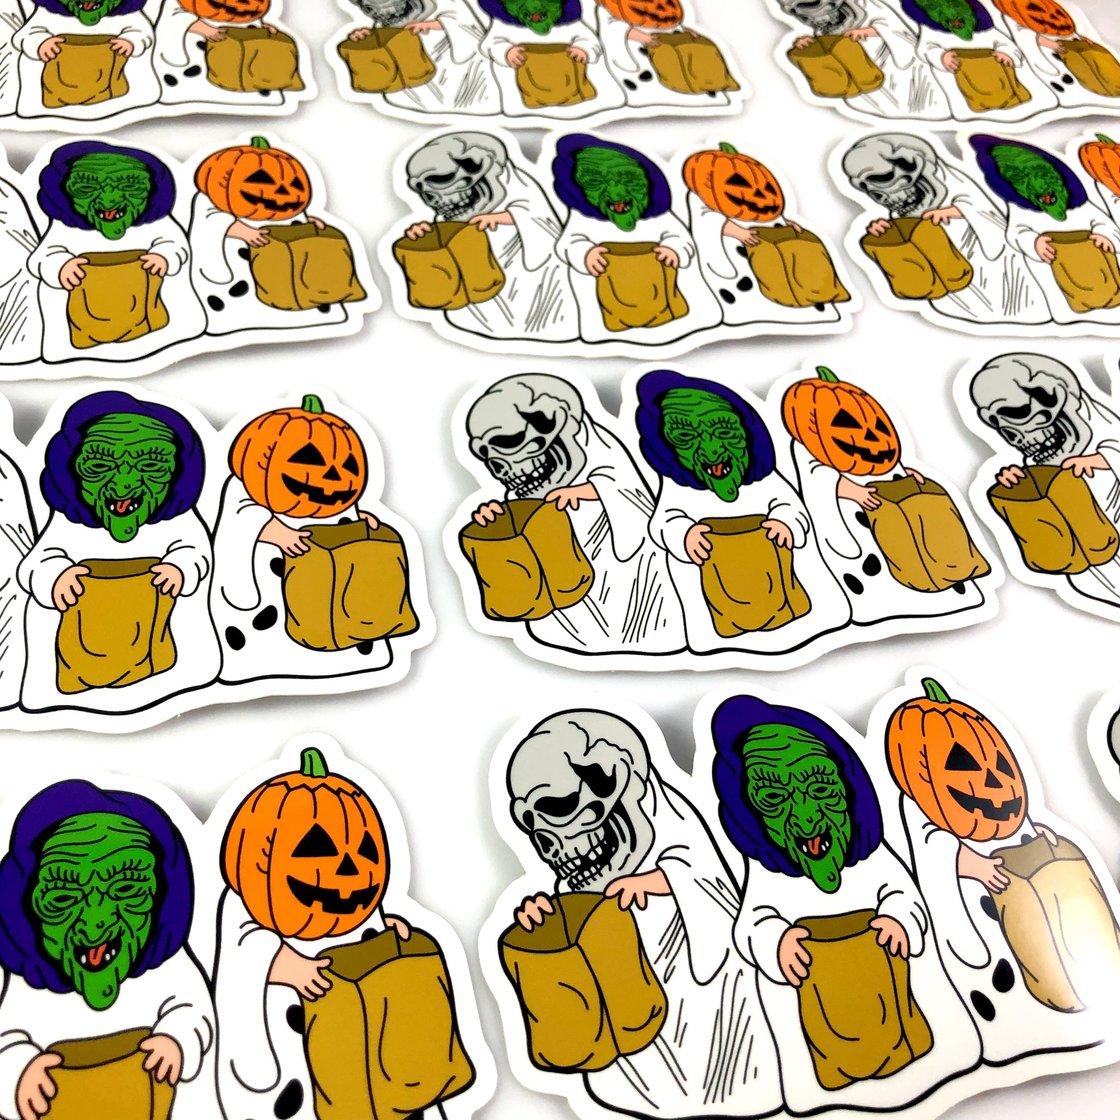 Image of Season of the Great Pumpkin (Die cut sticker)